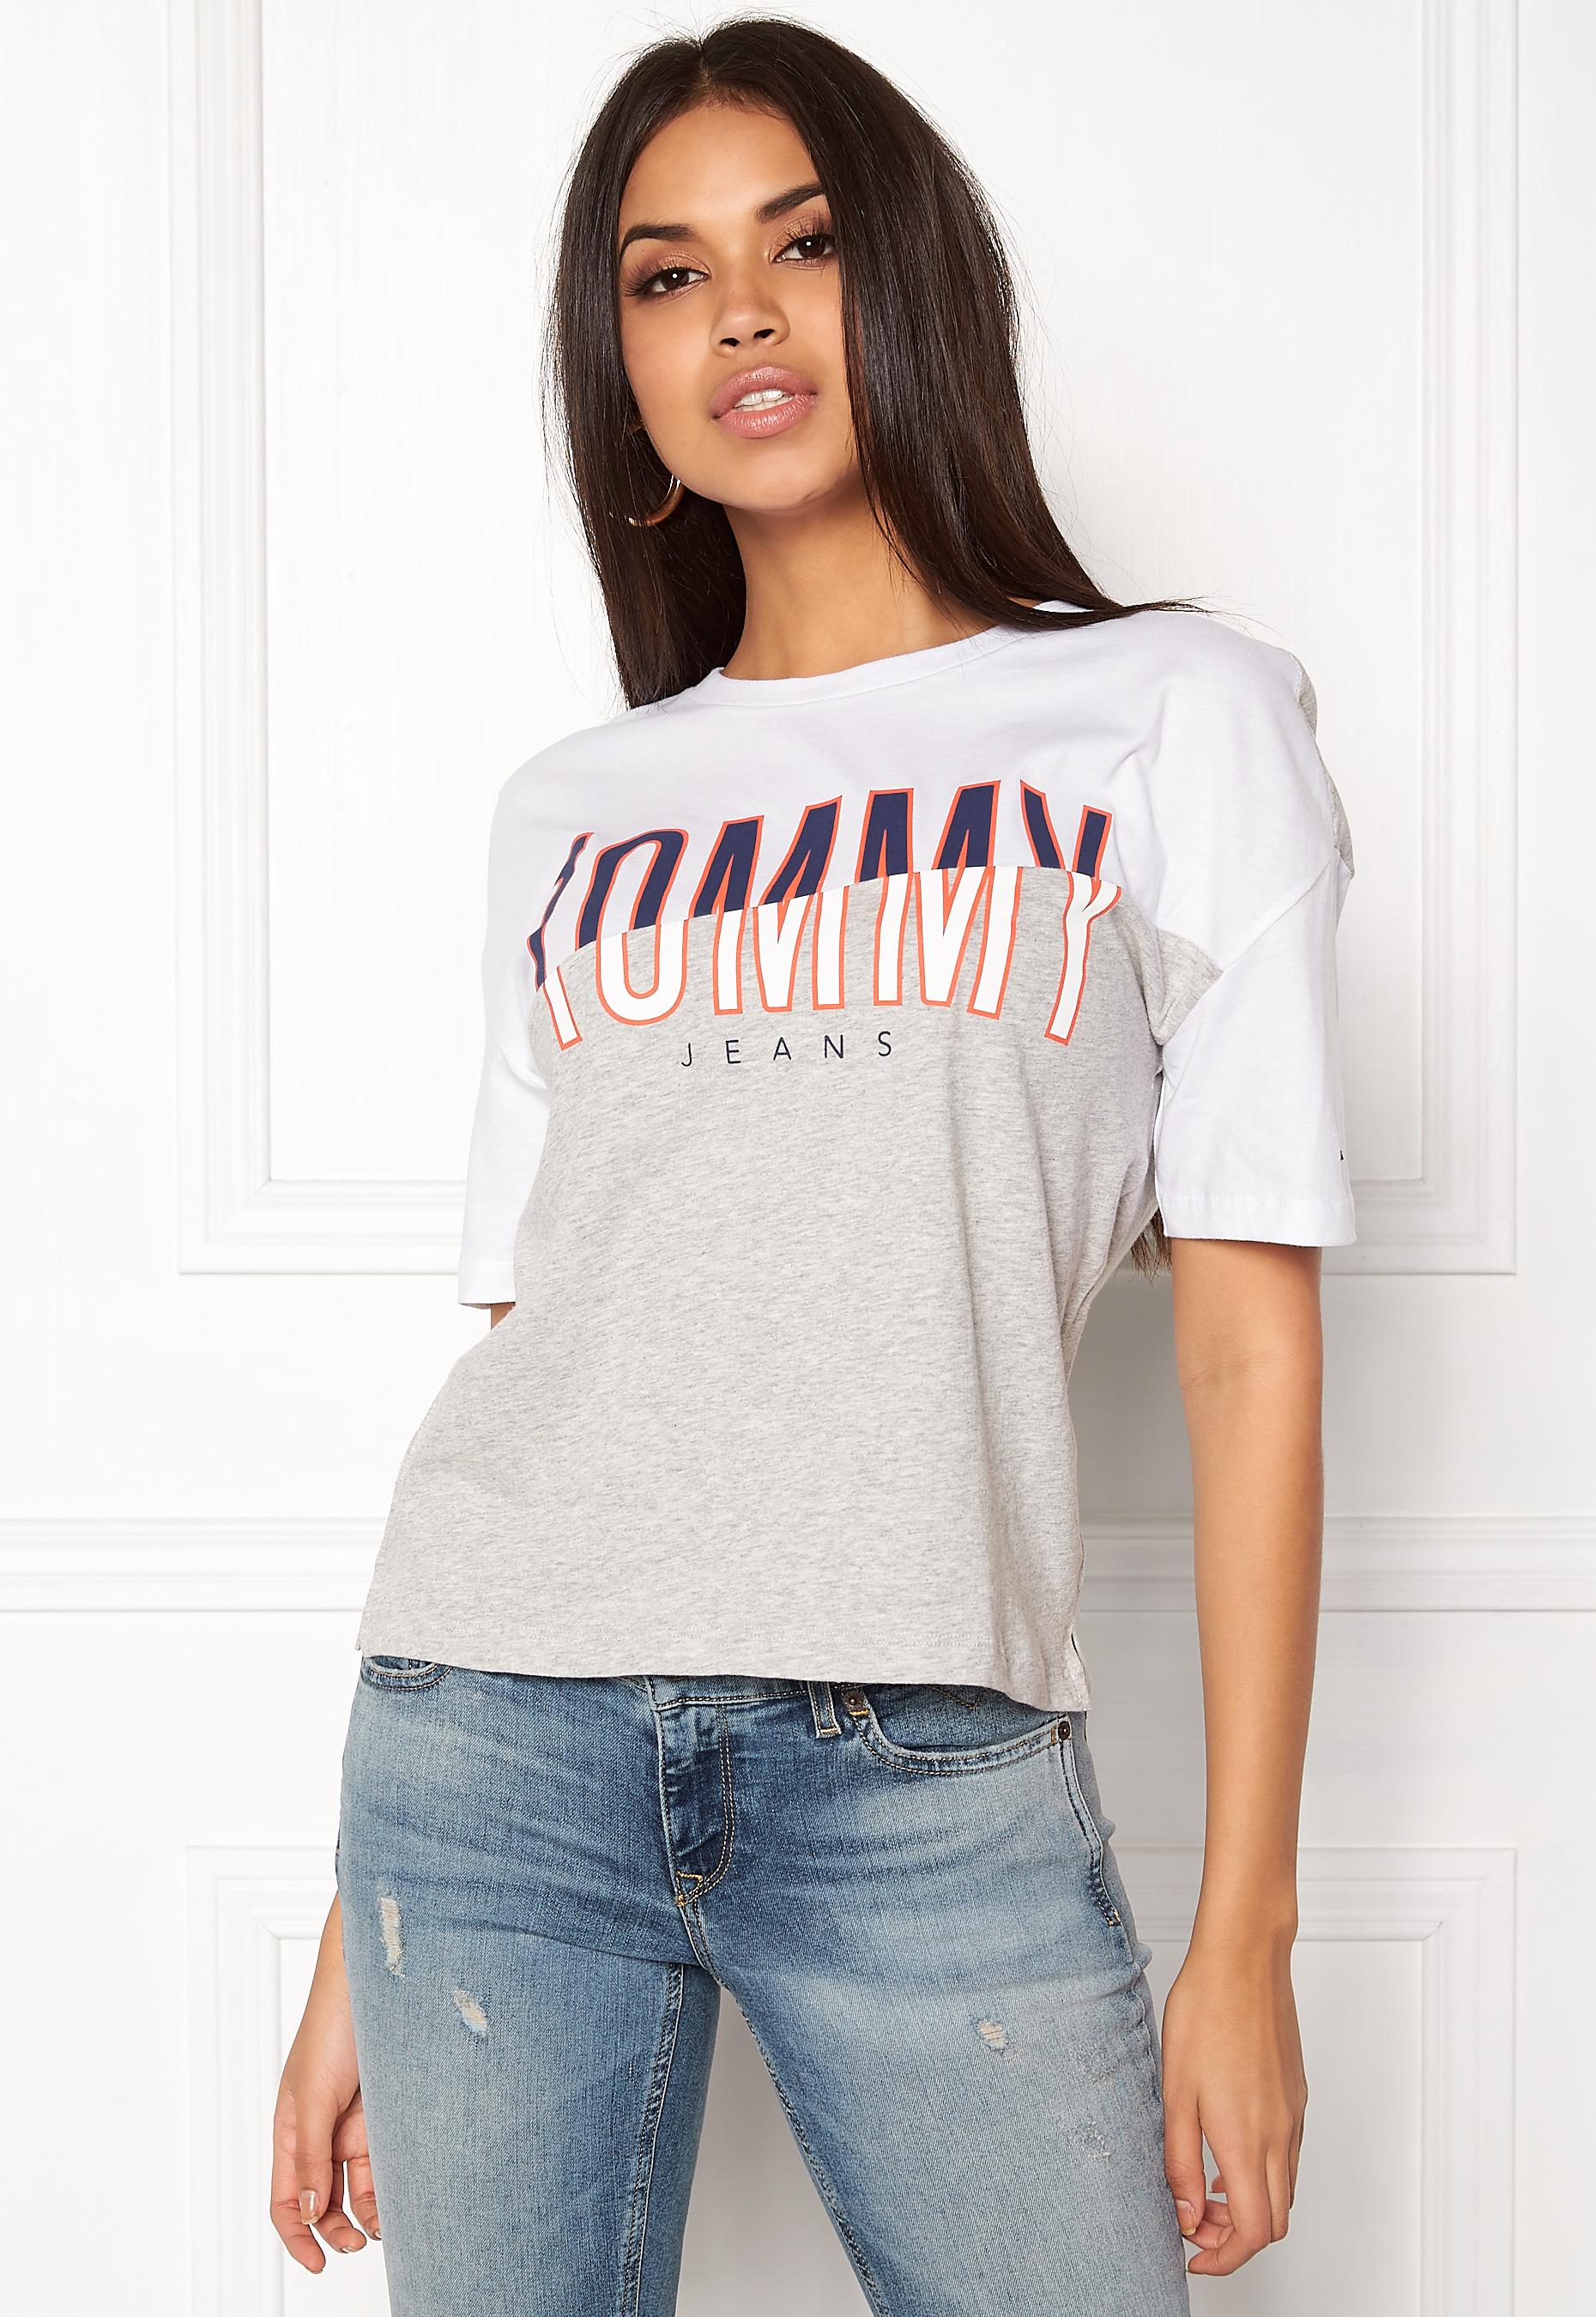 7cc8abdf TOMMY JEANS T-shirt S/S 21 Bright White - Bubbleroom